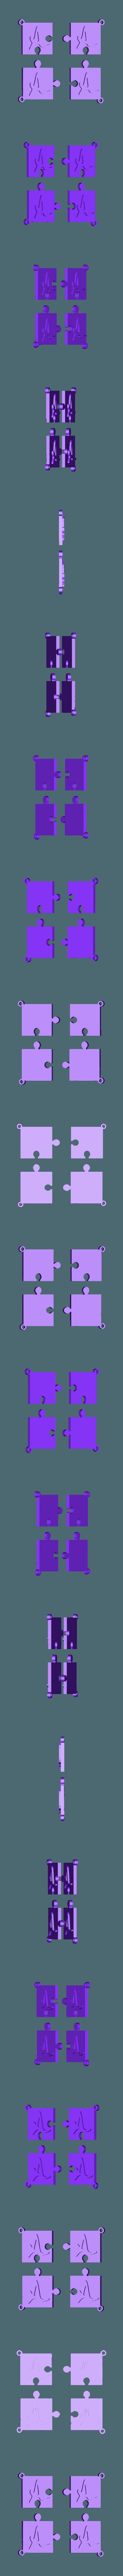 puzzle a.stl Download STL file puzzle key ring • 3D printing design, catf3d